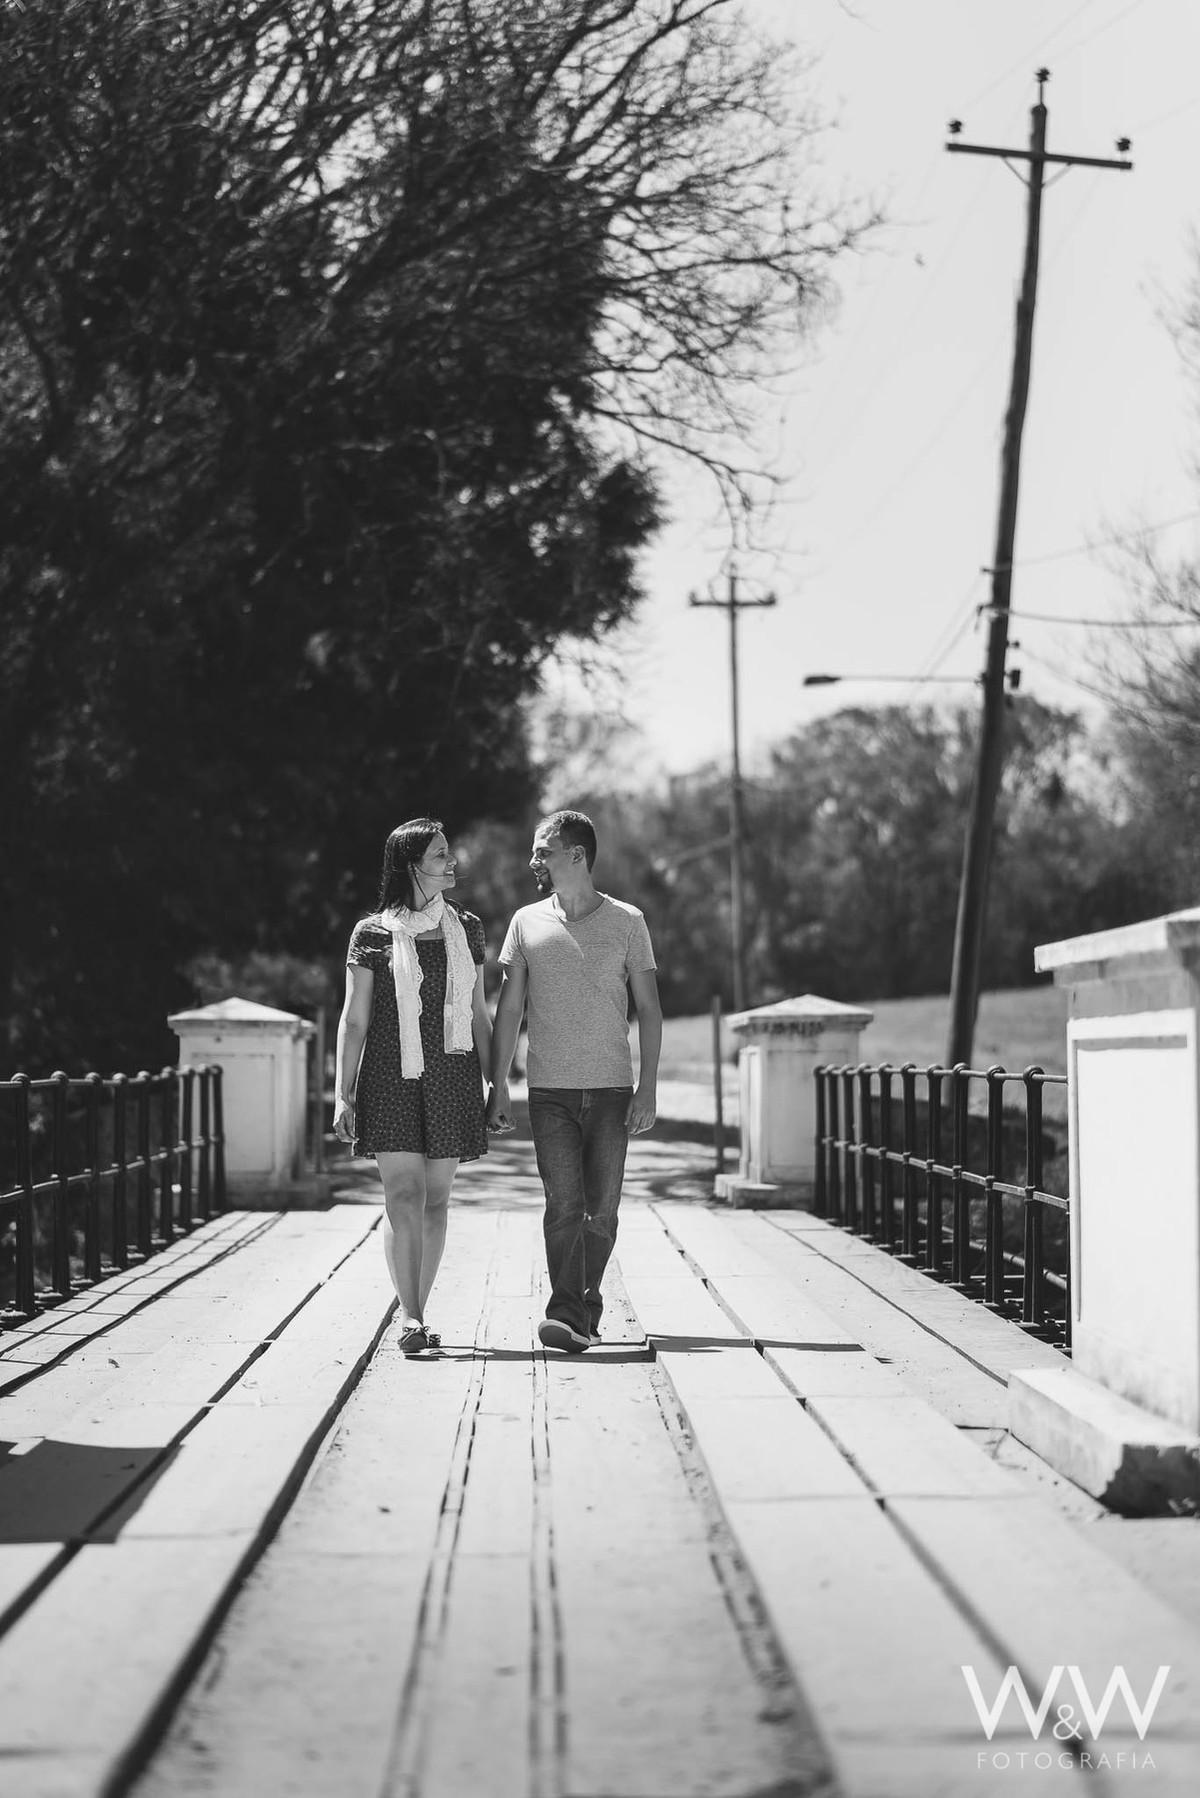 fazenda ipanema ipero prewedding casal ensaio ponte